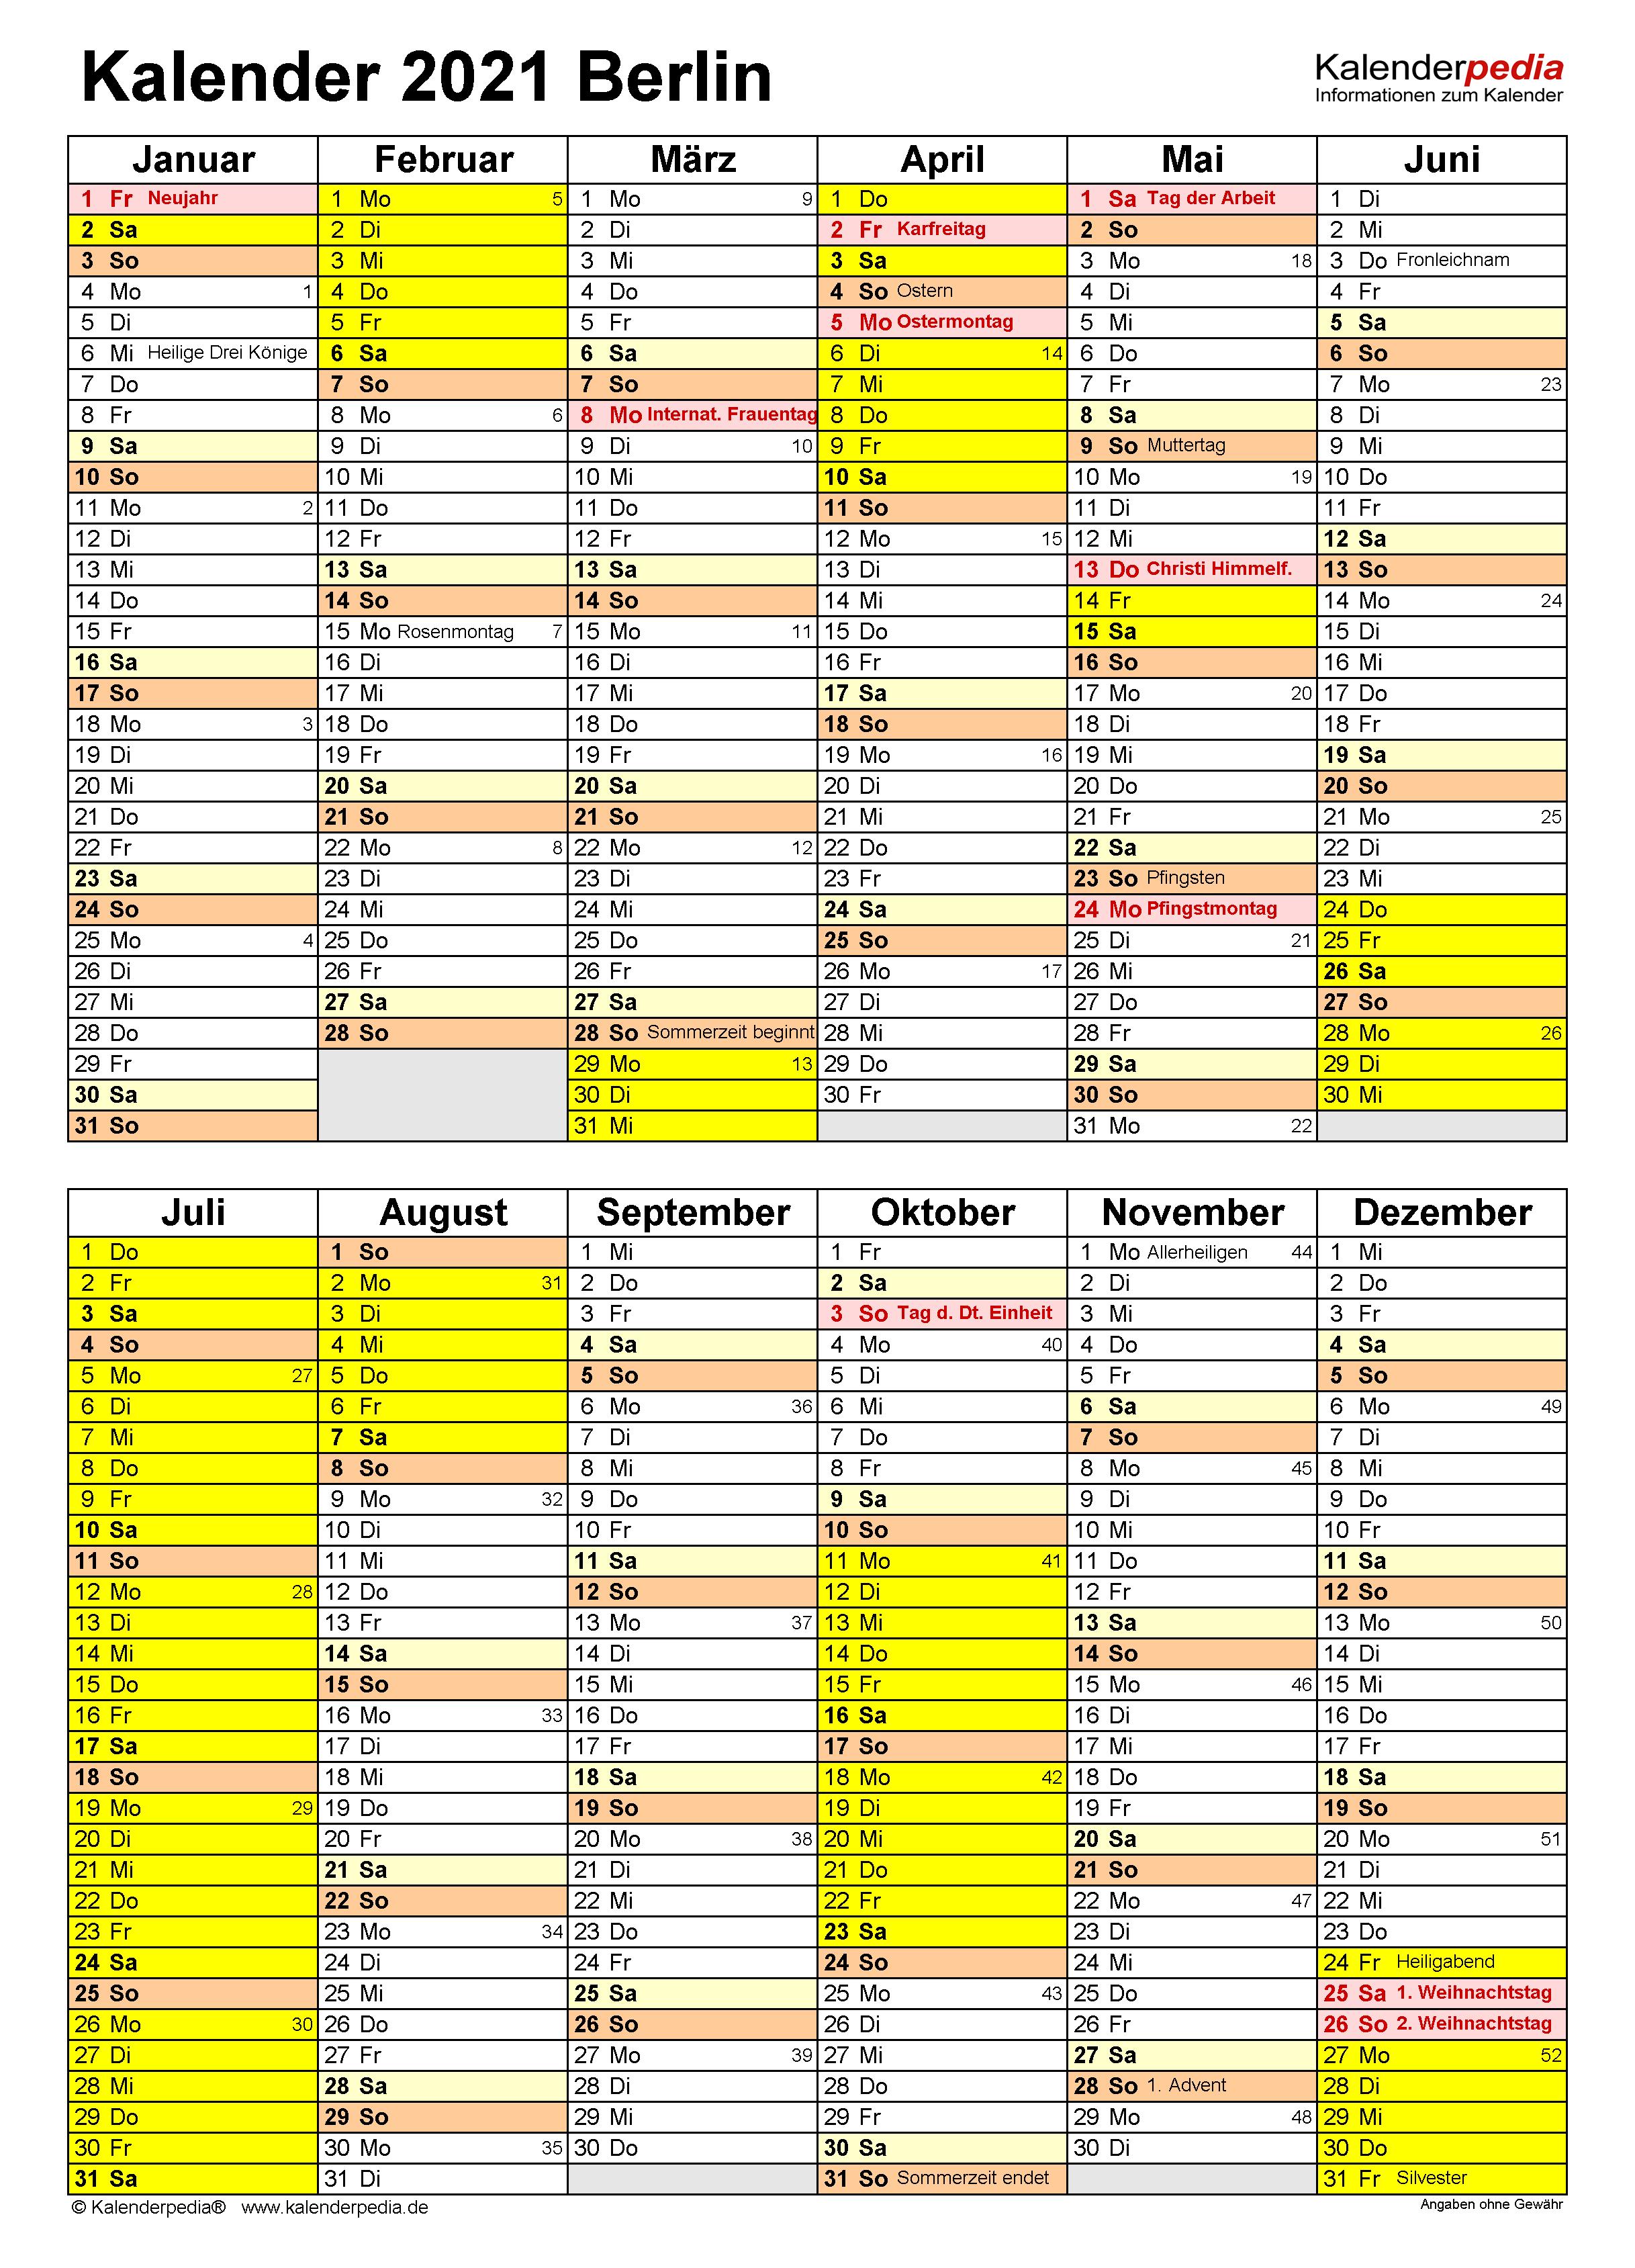 Kalender Berlin